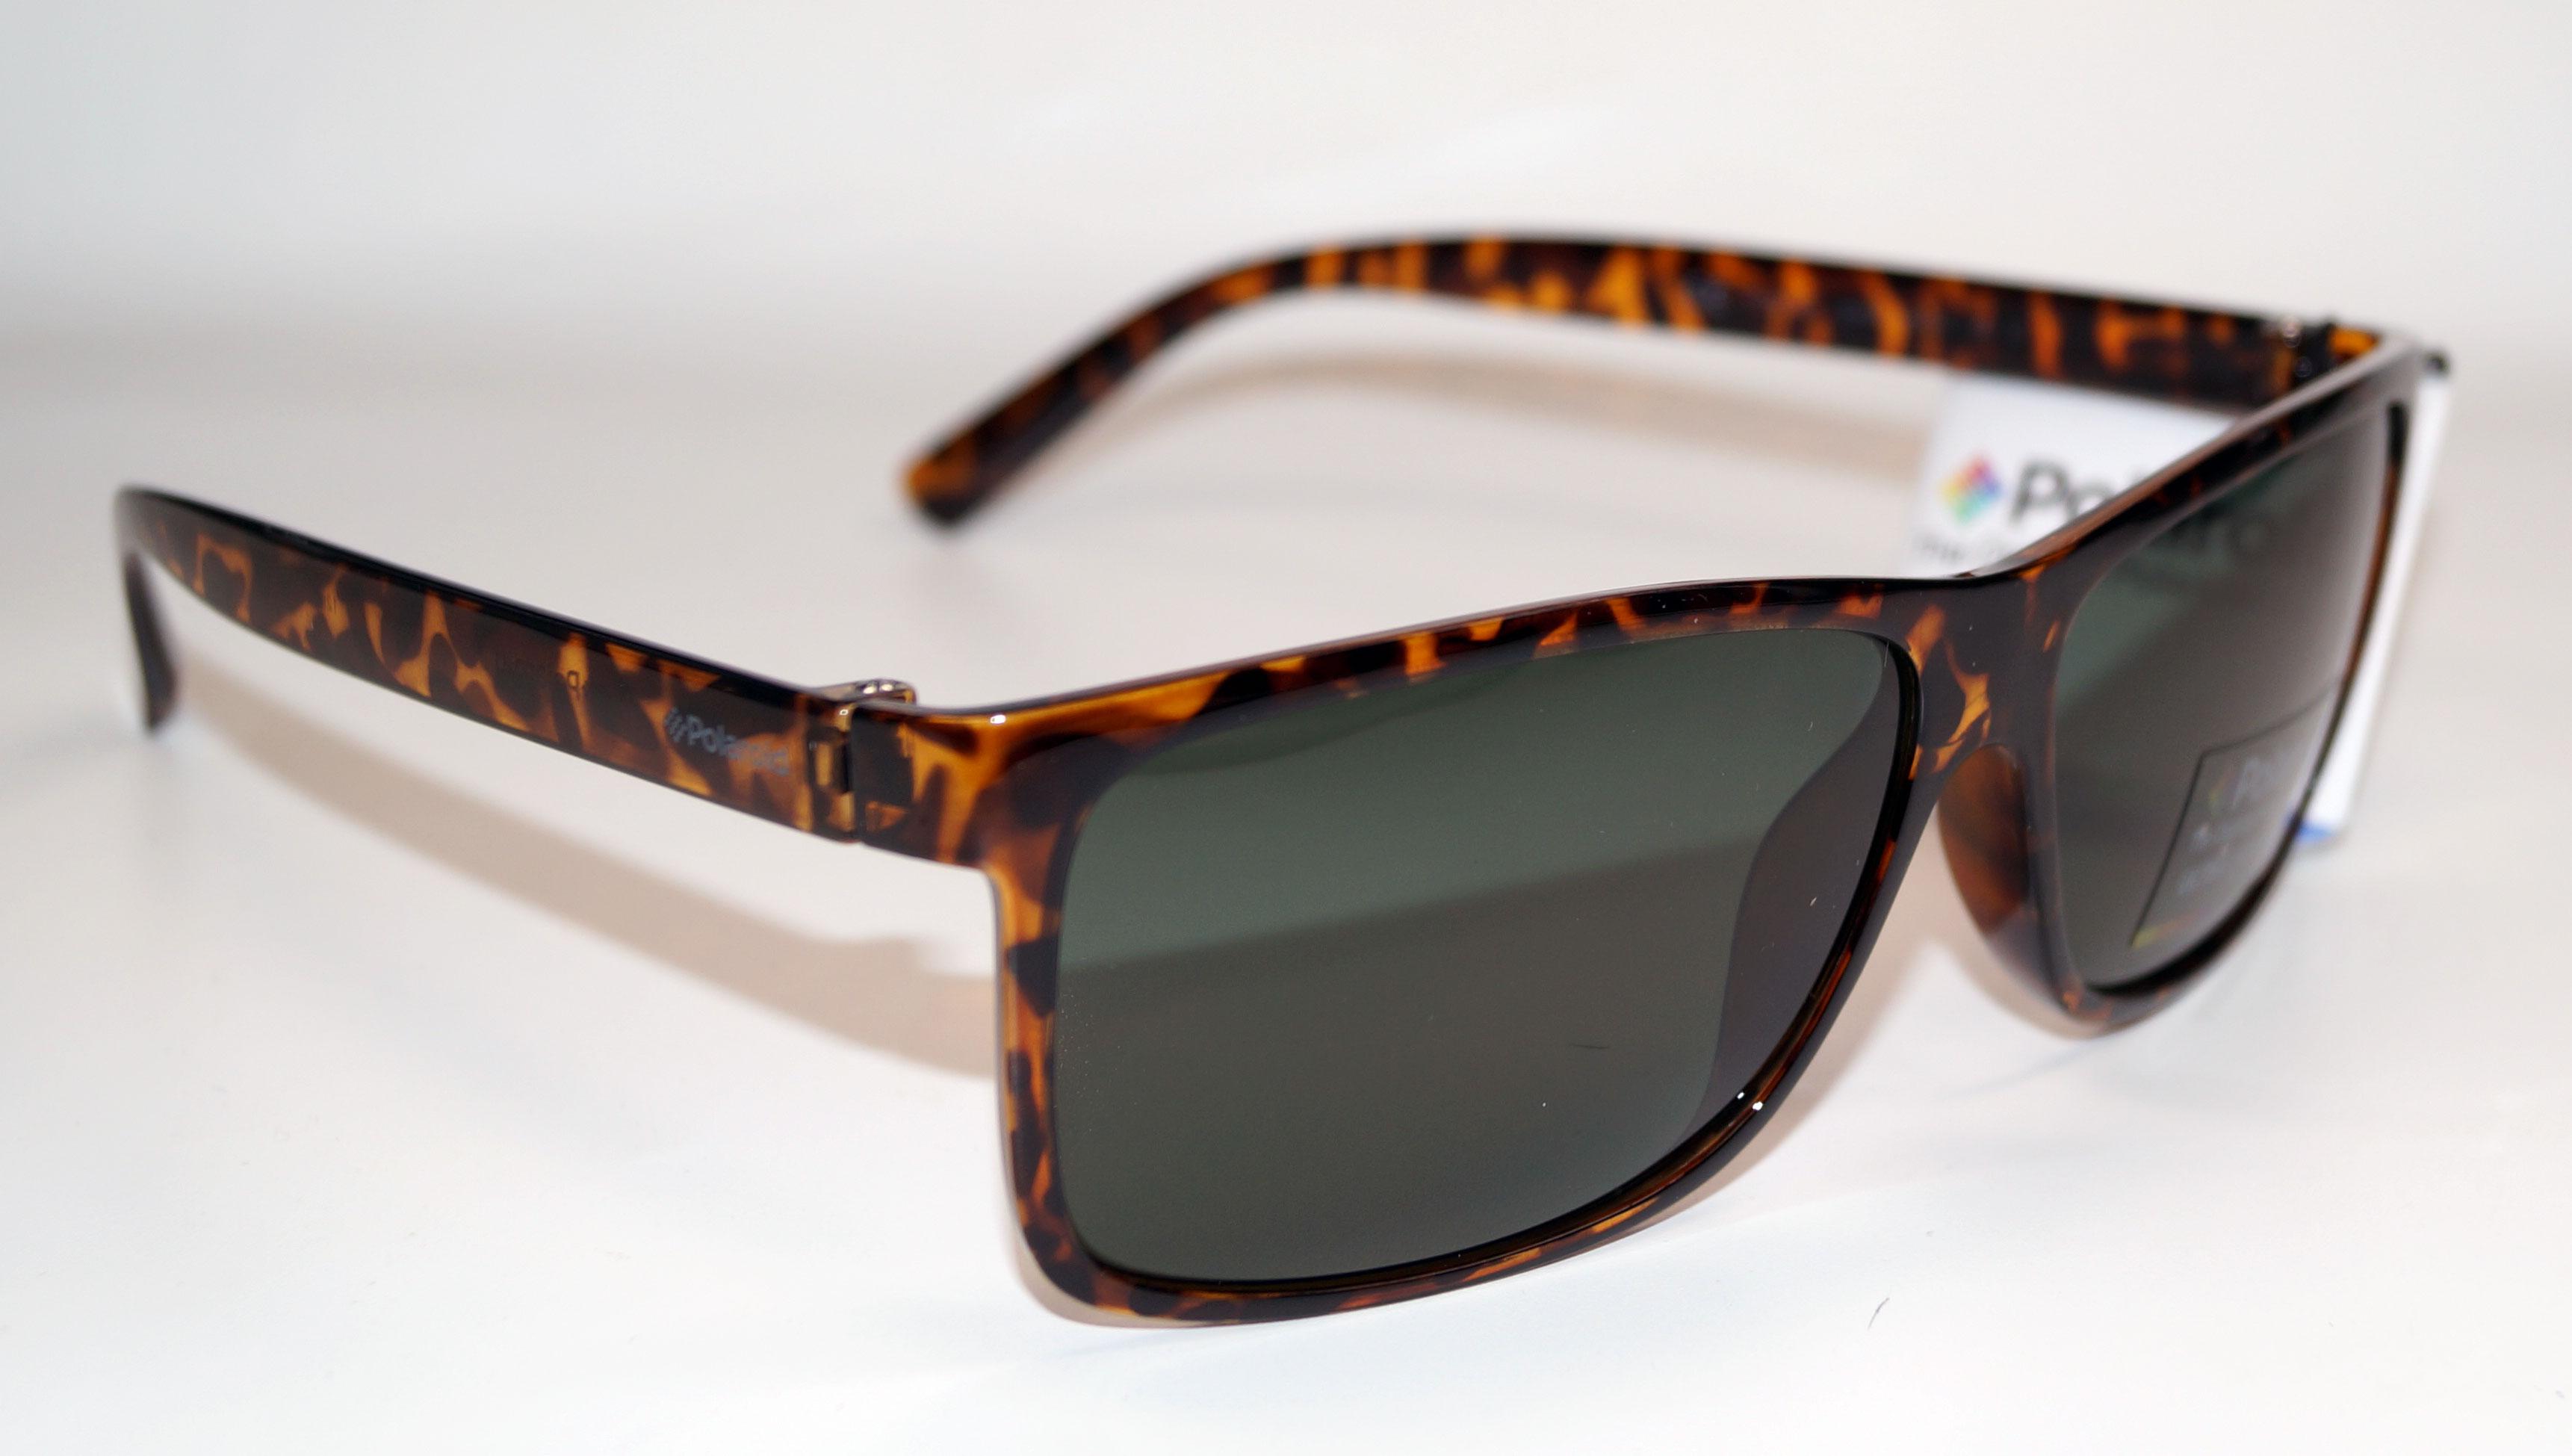 POLAROID Sonnenbrille Sunglasses PLD 3010 VO8 H82 - Polarized